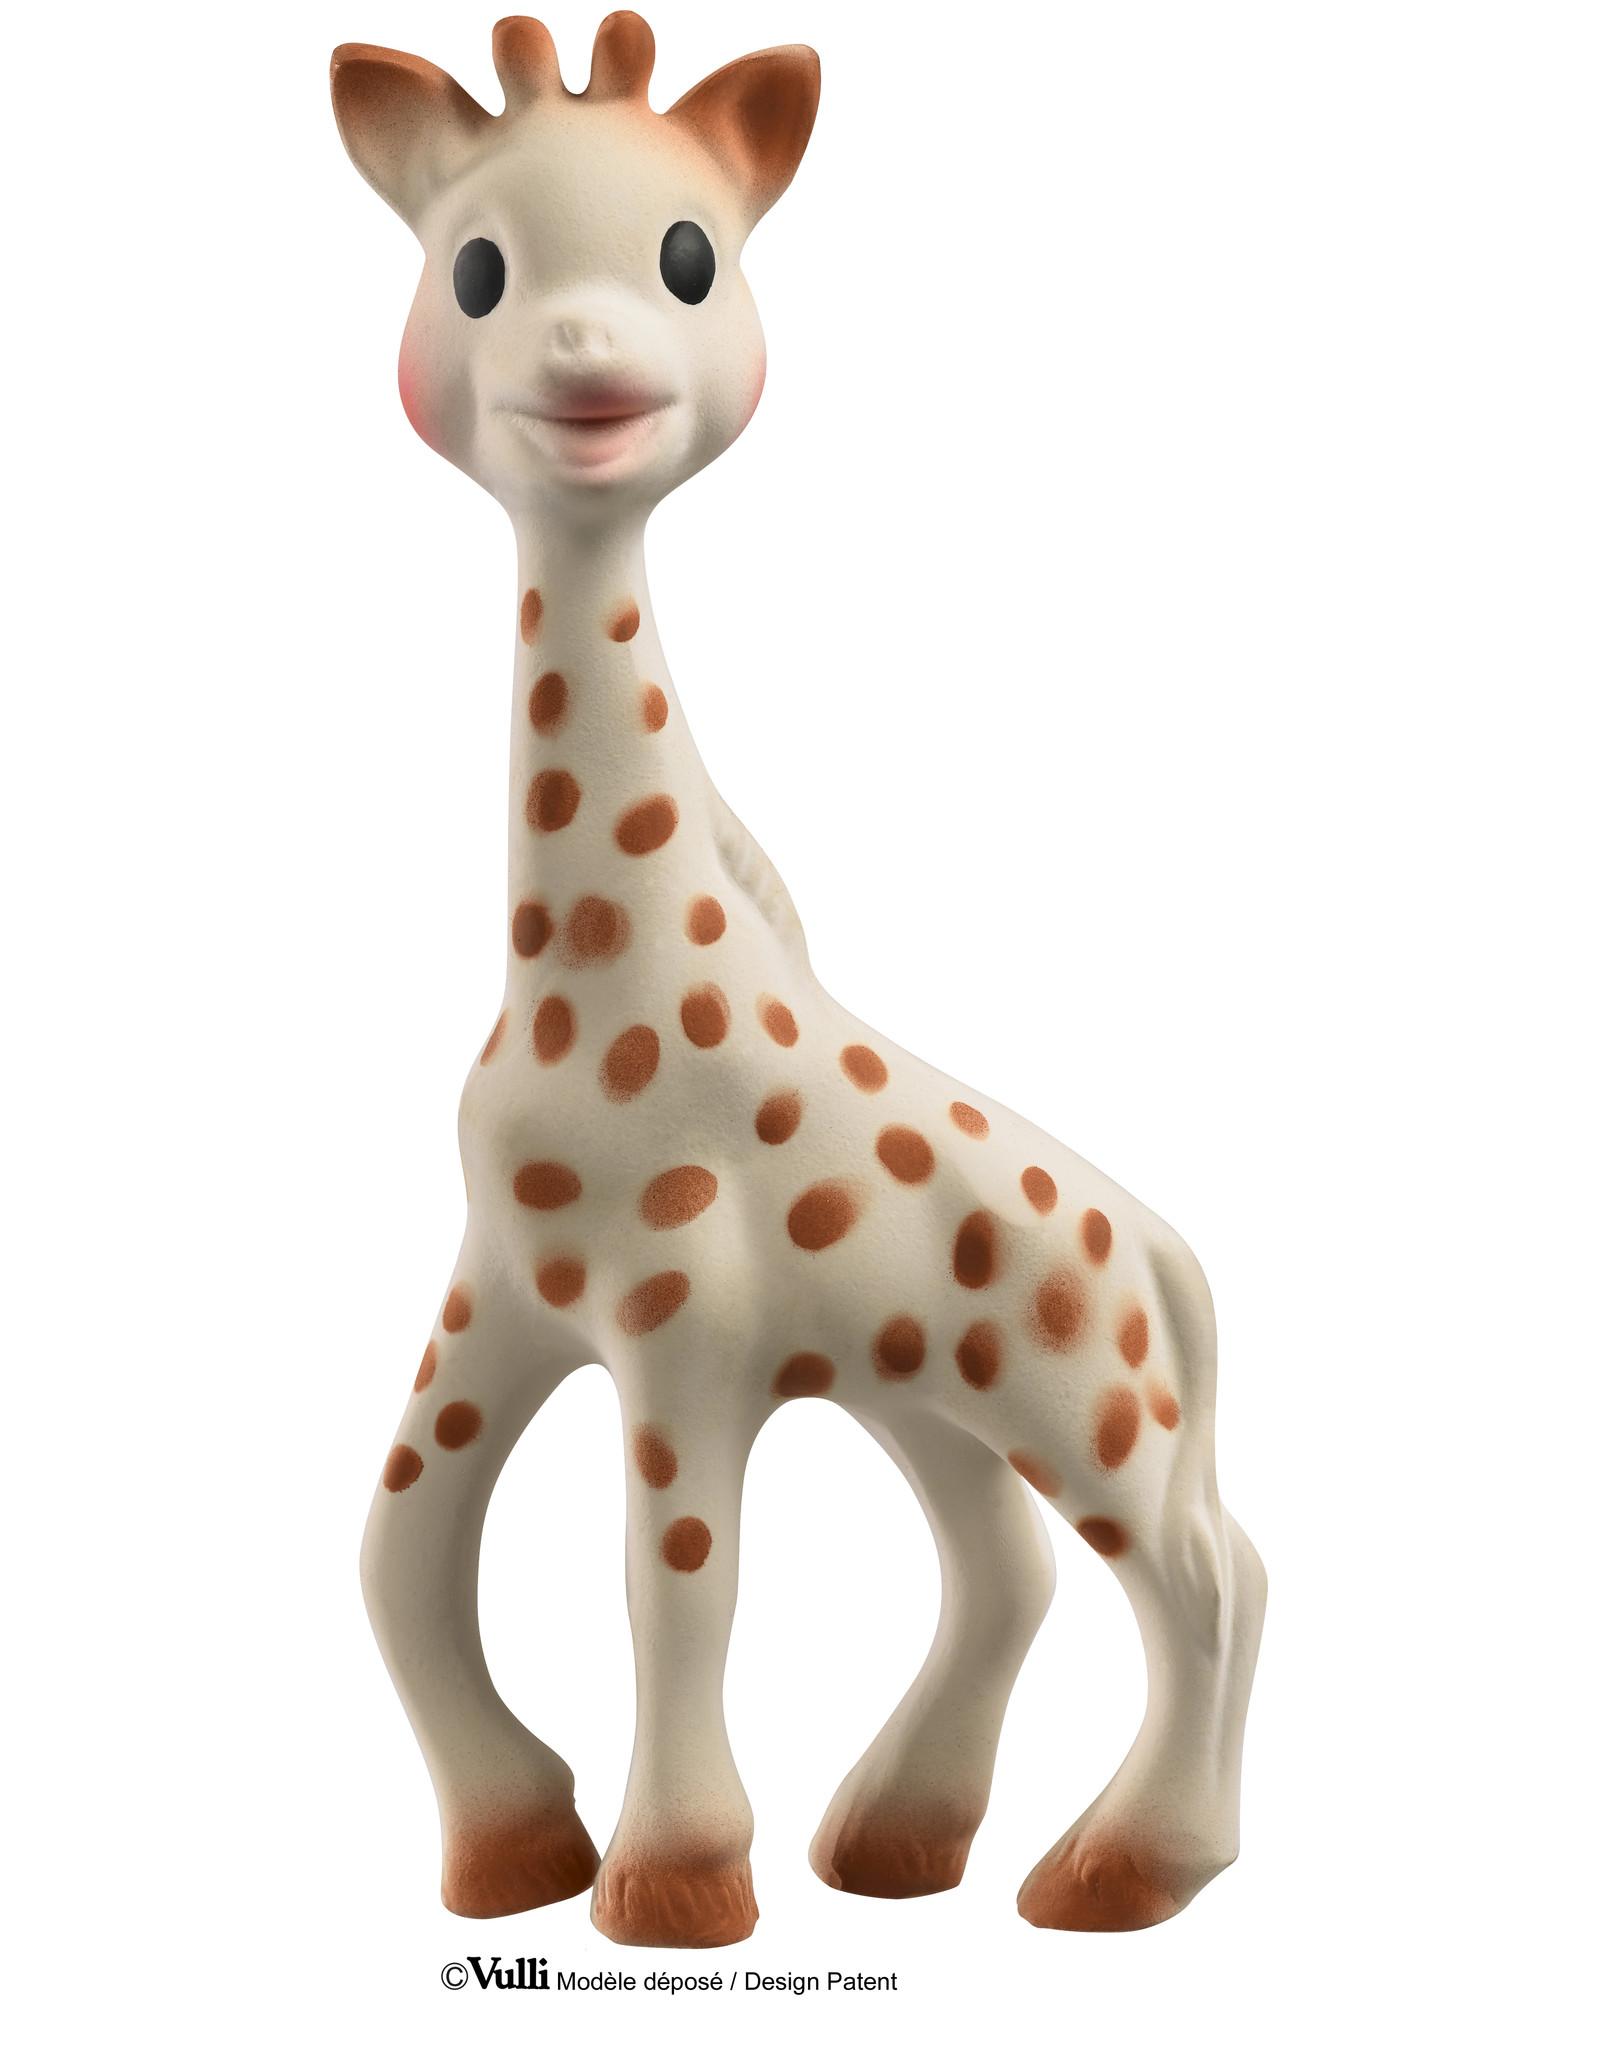 Sophie de Giraf Sophie de girafe